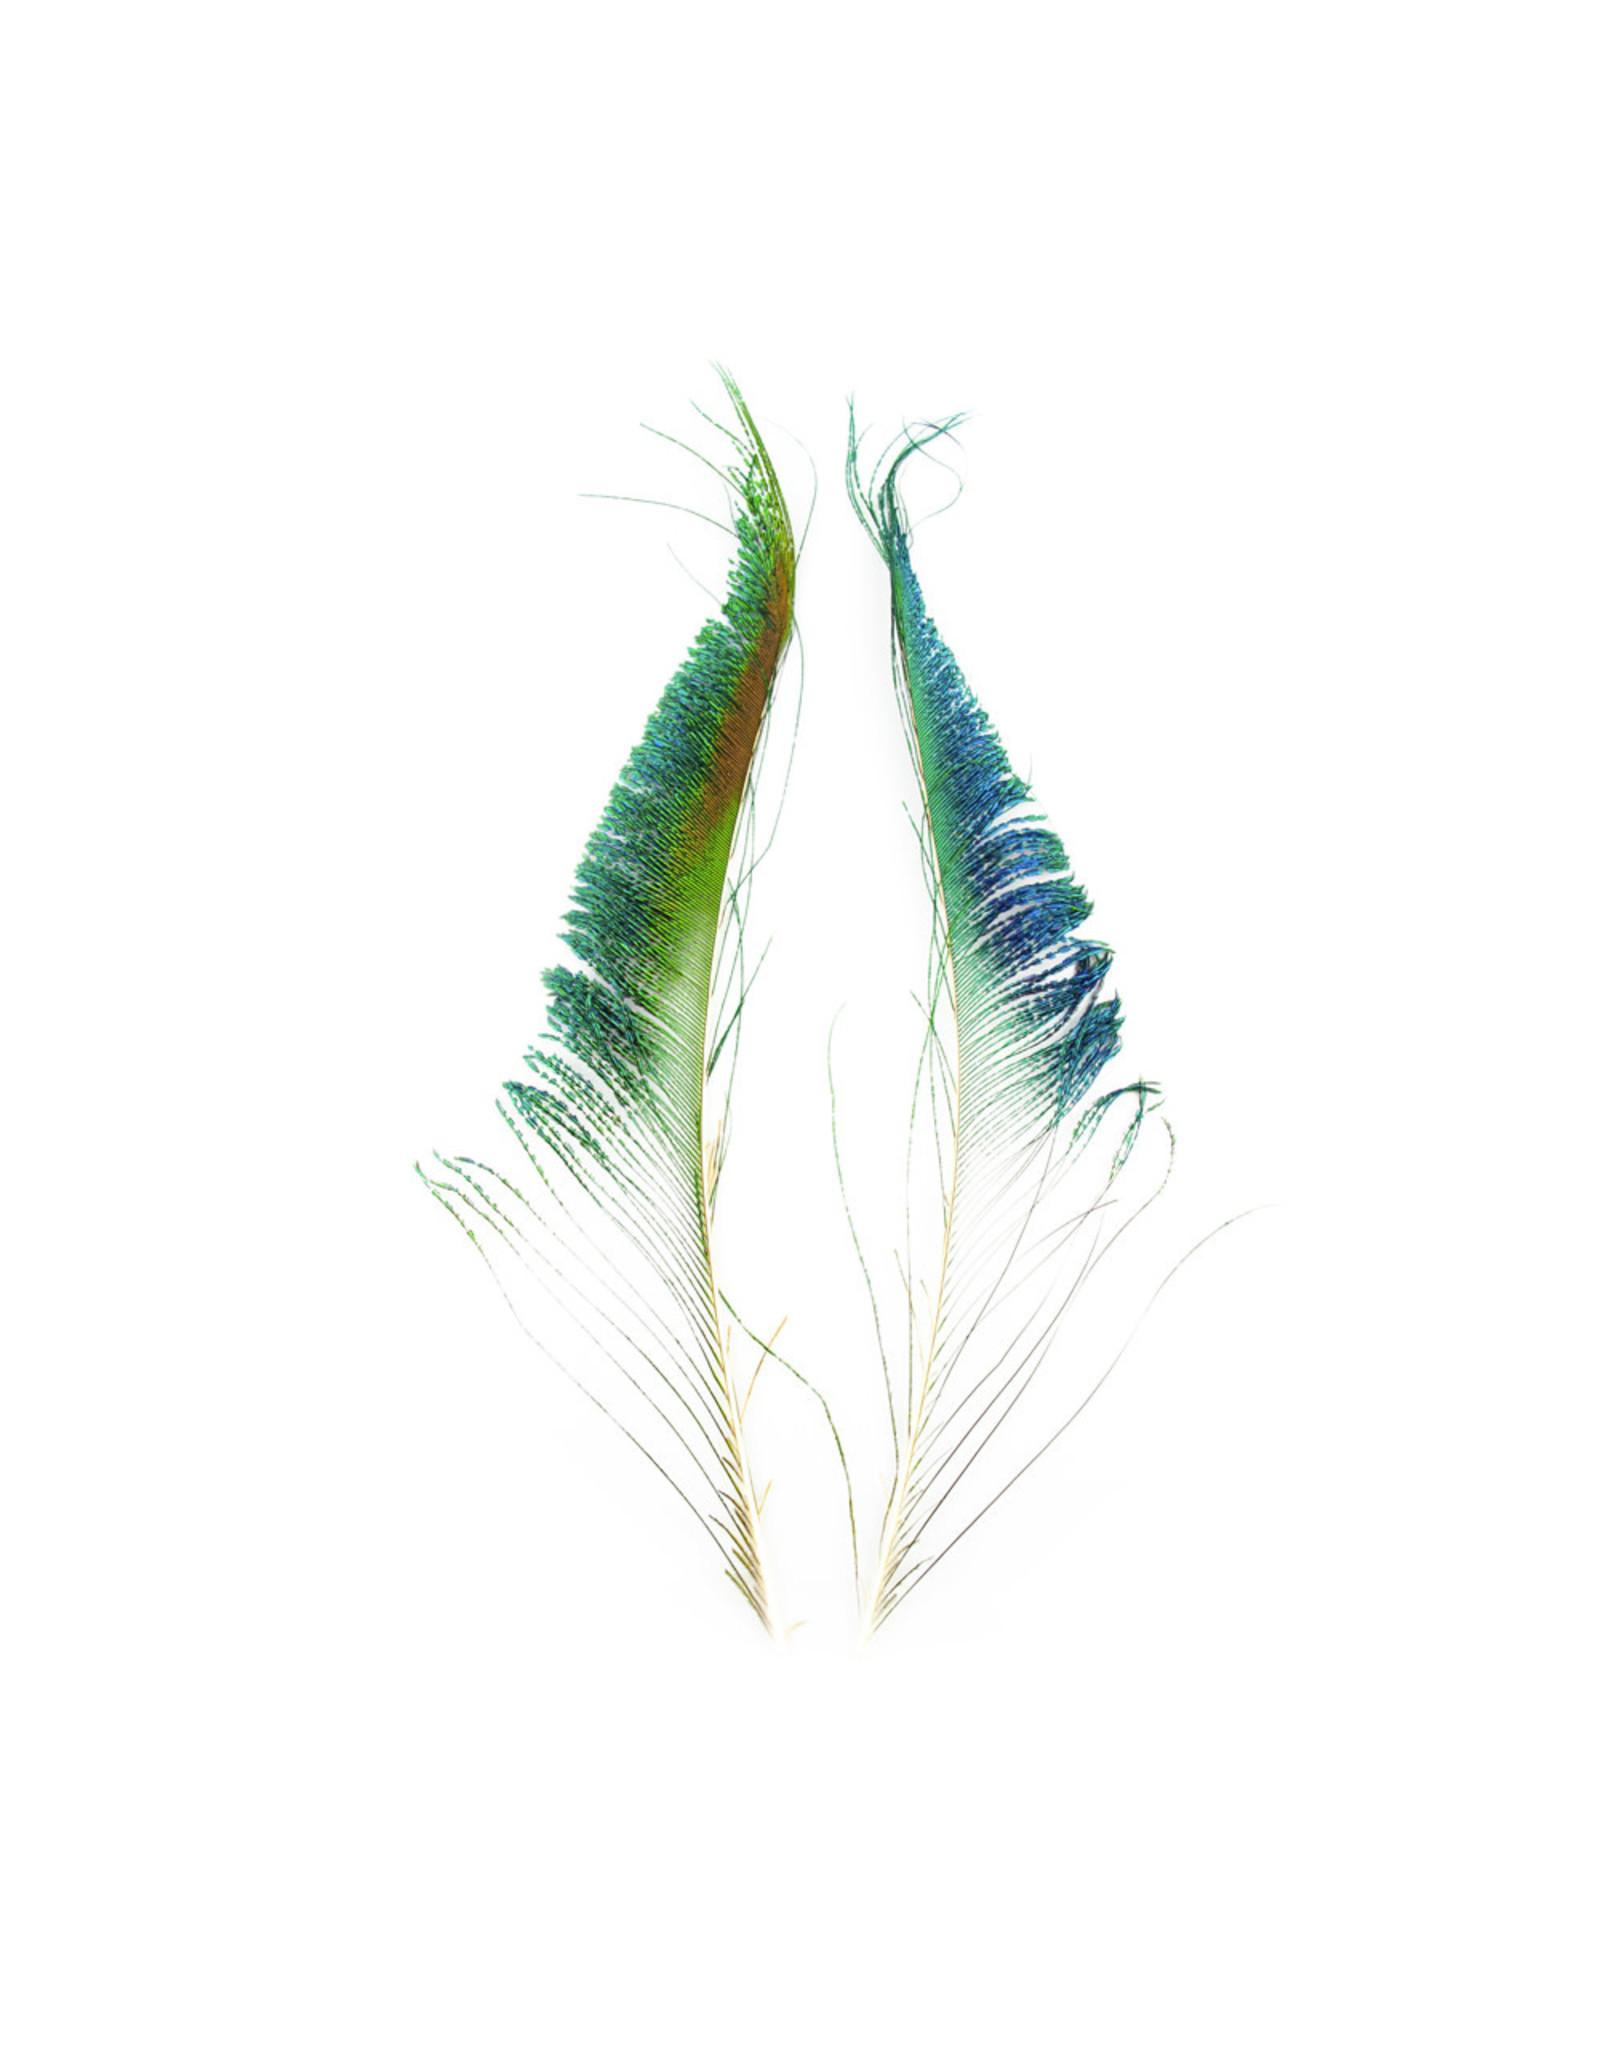 SHOR SHOR Peacock Swords 2pk (NOT PAIRED)